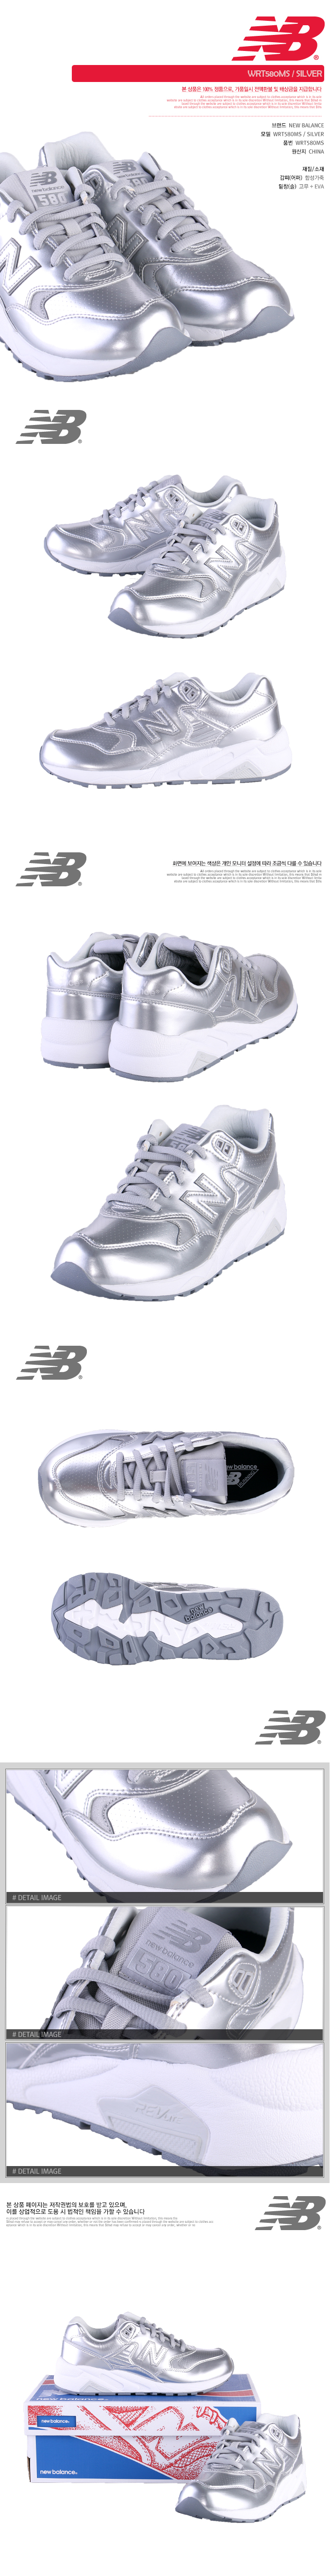 brand new b1d49 8cd21 G마켓 - 뉴발란스(NEW BALANCE) WRT580MS SILVER(unisex ...